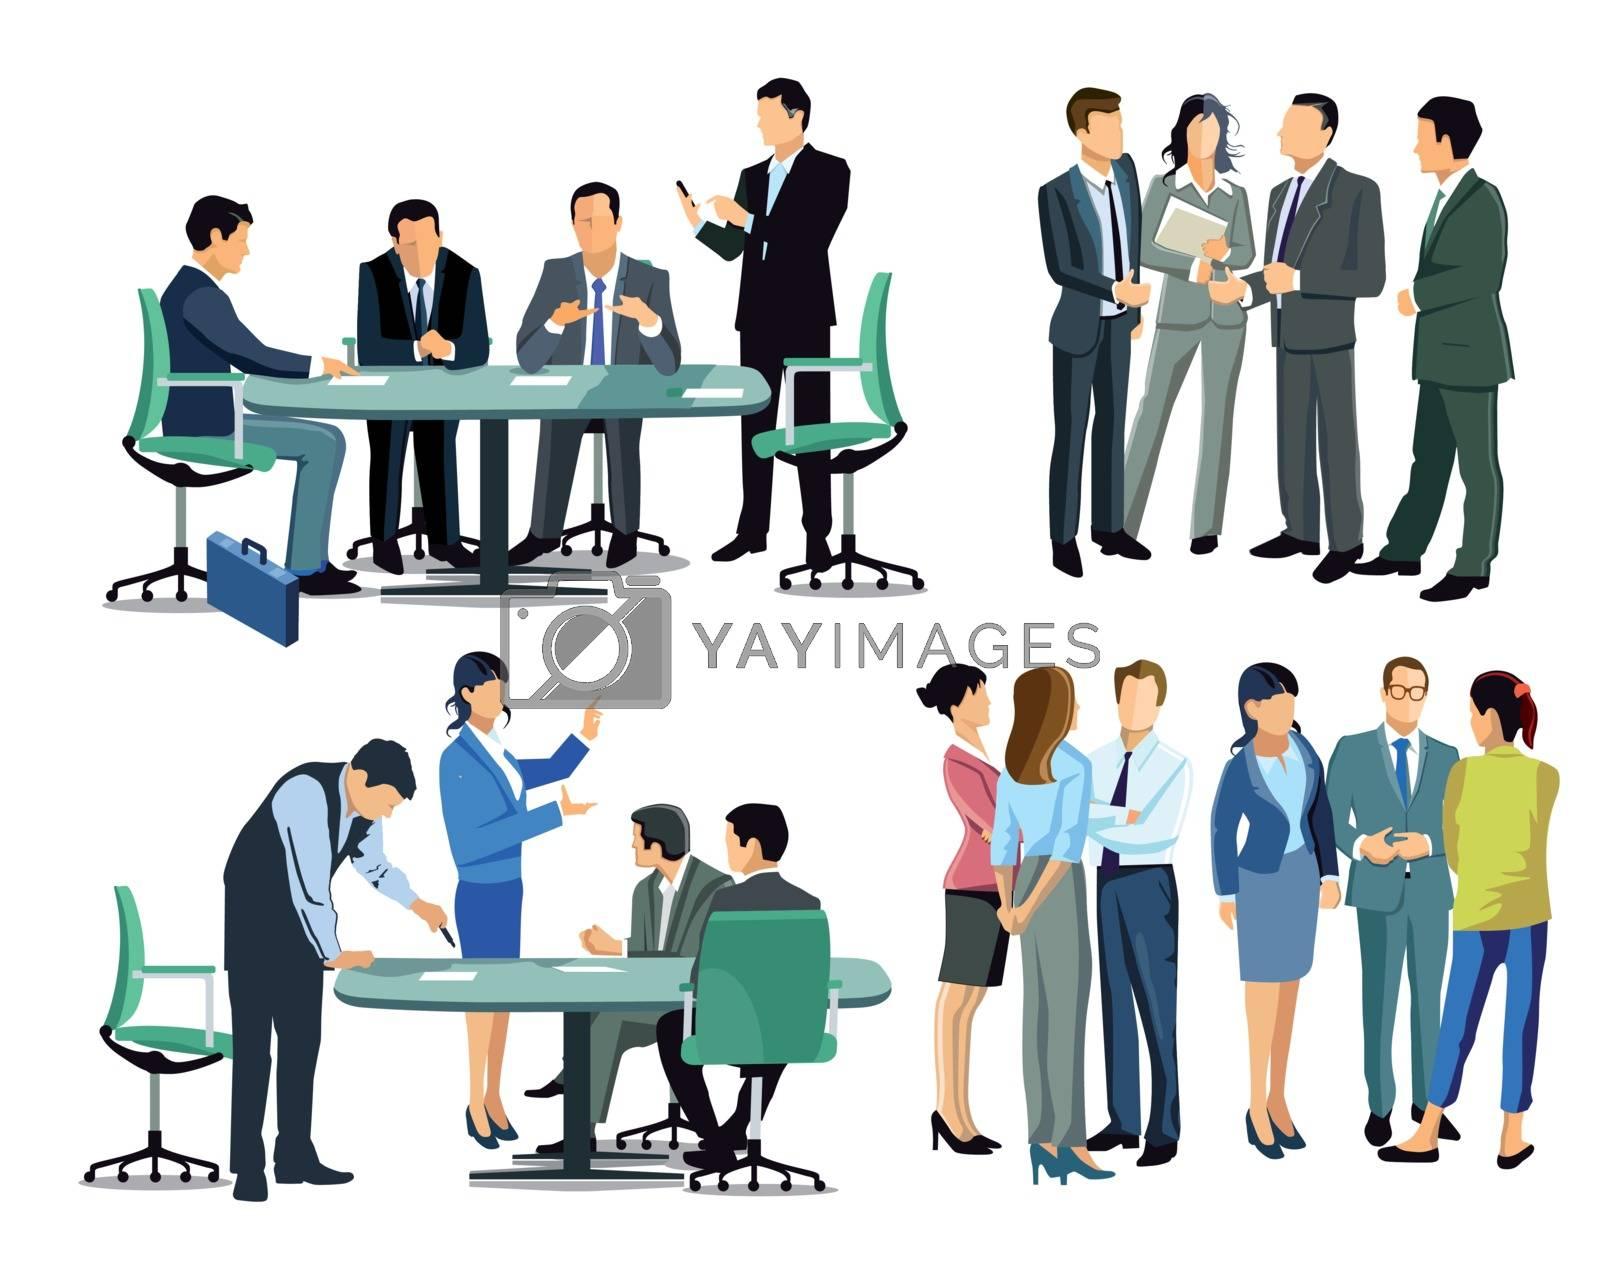 Business meeting among business people